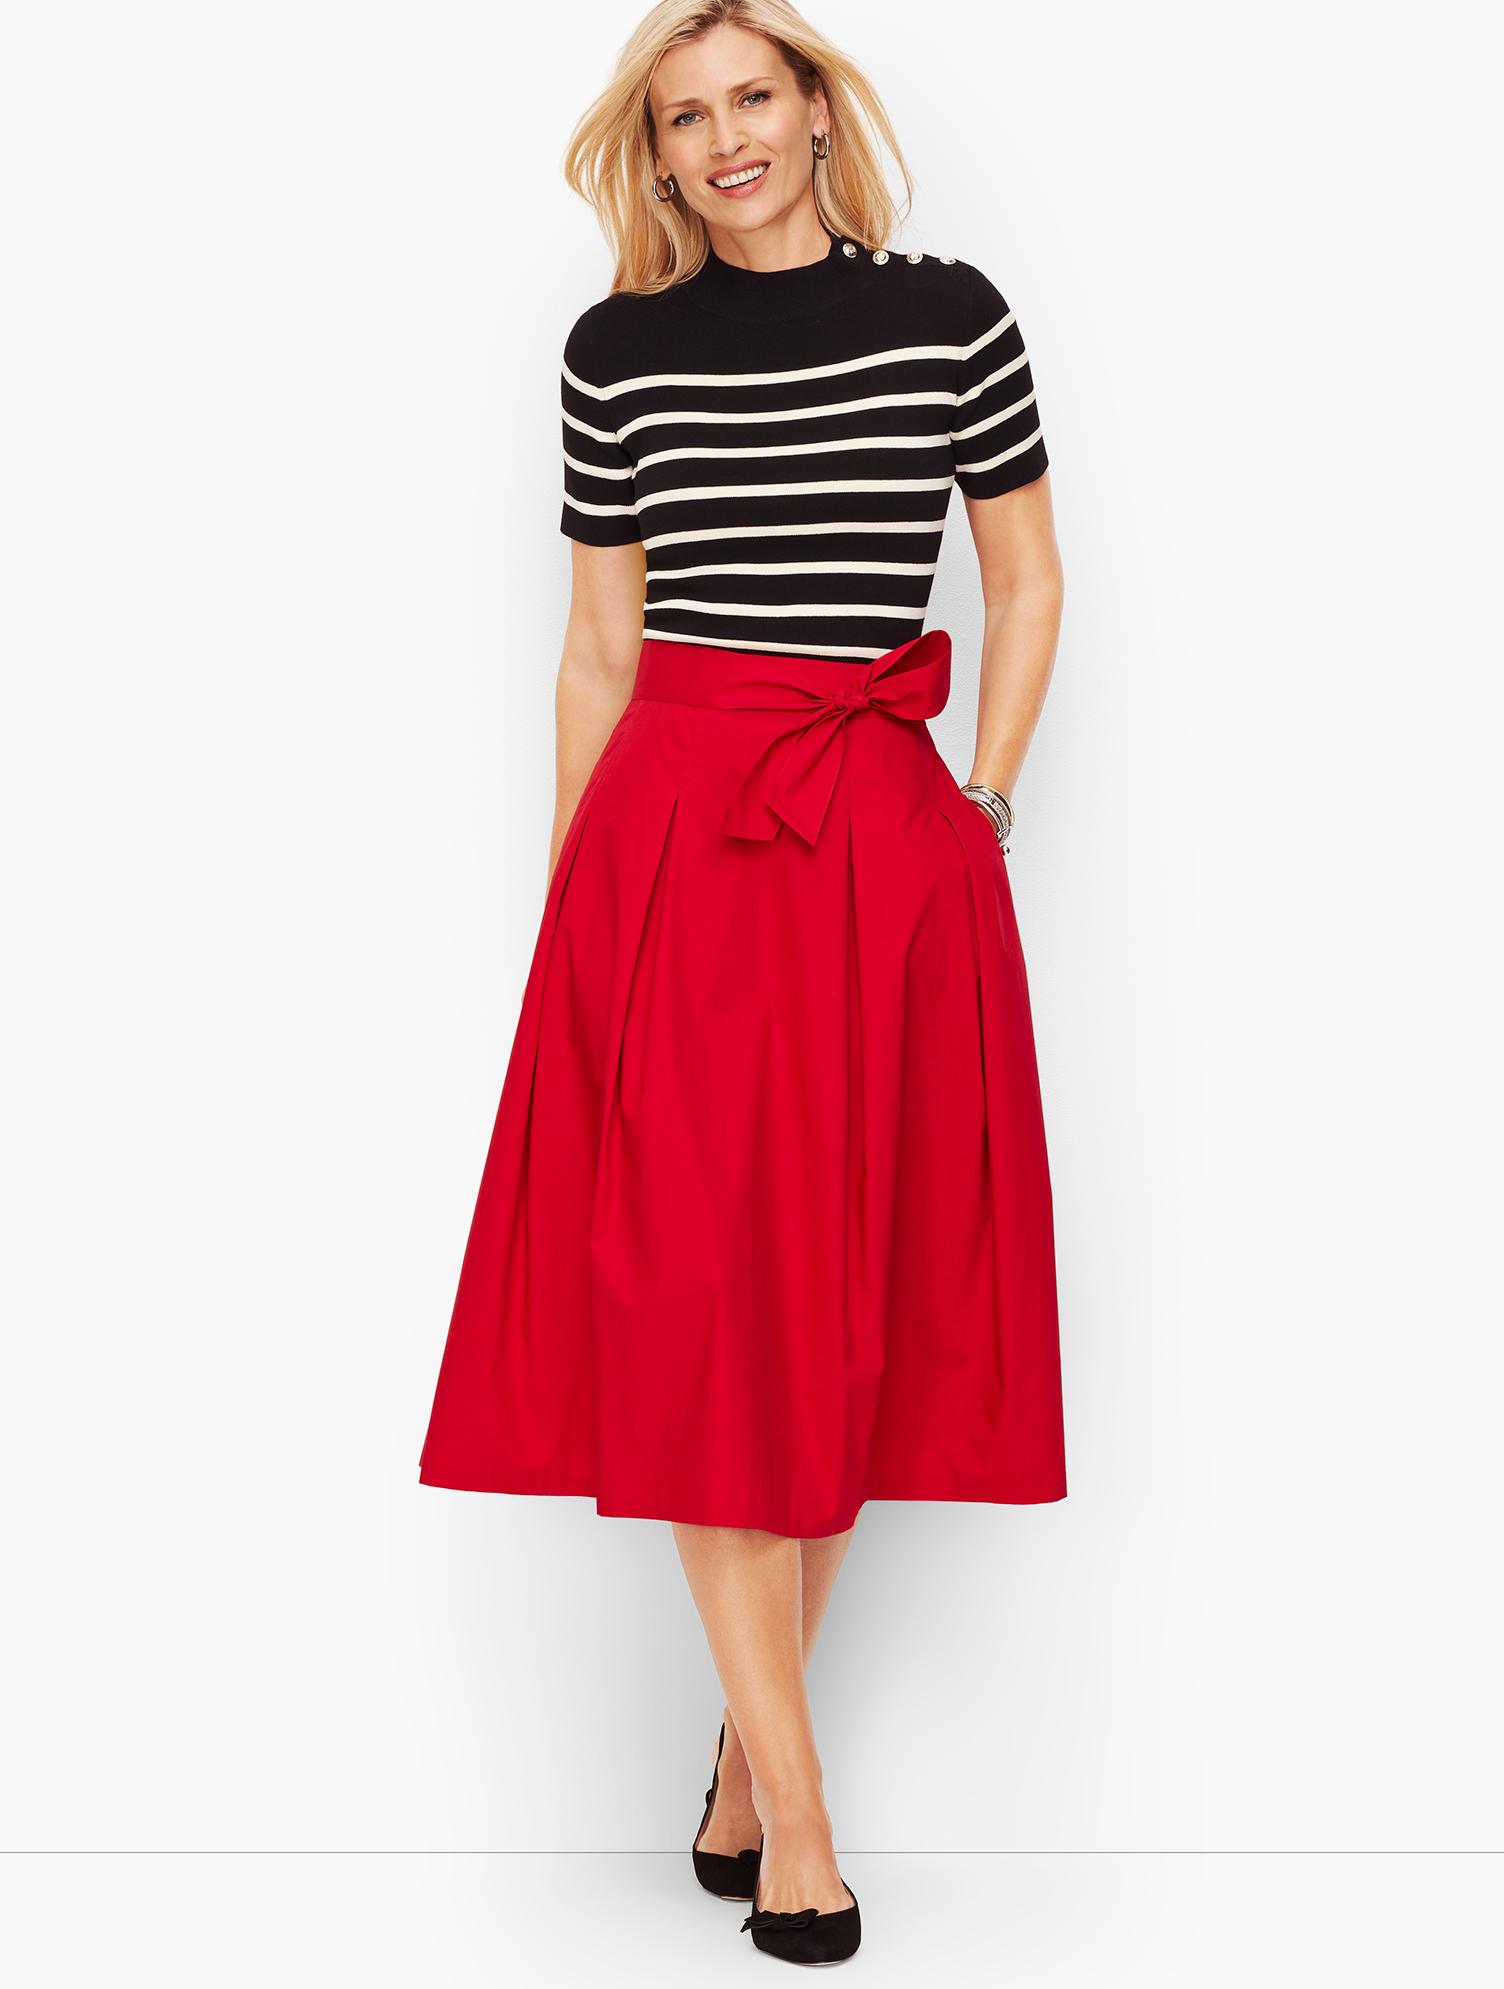 60s Skirts | 70s Hippie Skirts, Jumper Dresses Poplin Full Skirt - RED-POP - 16 - Talbots $74.25 AT vintagedancer.com